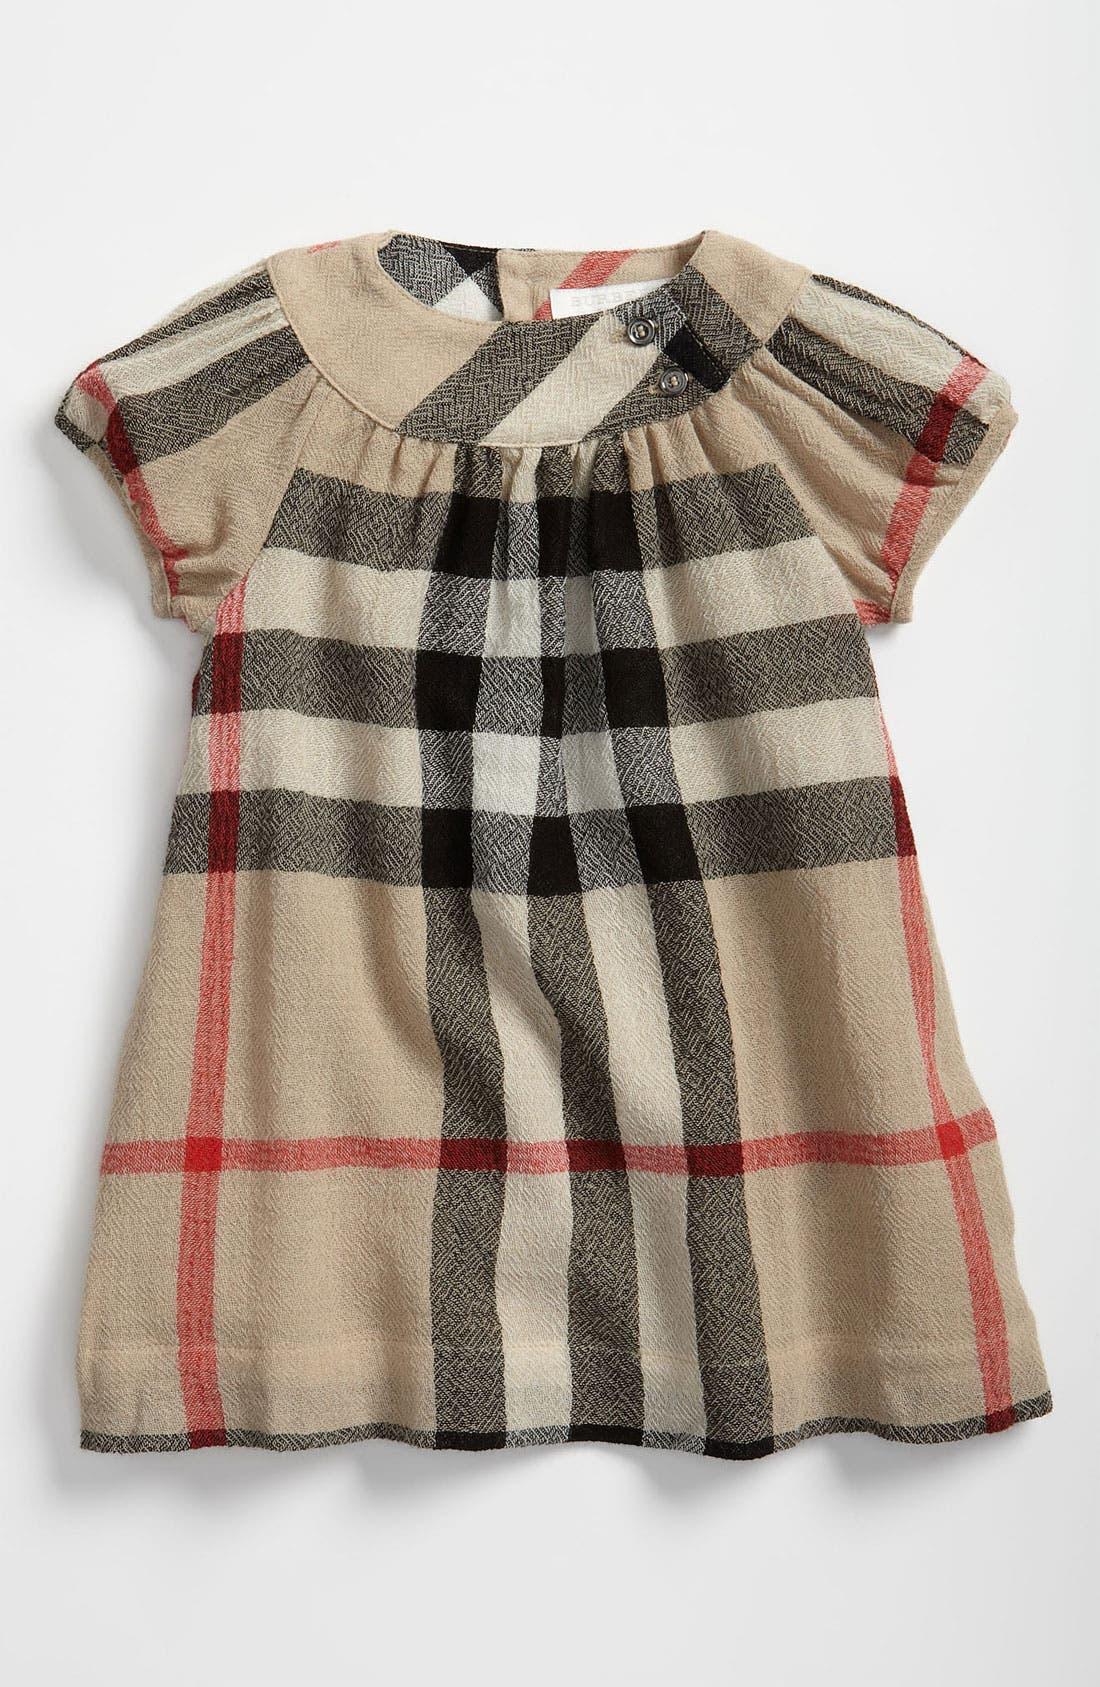 Main Image - Burberry Check Print Dress (Infant)